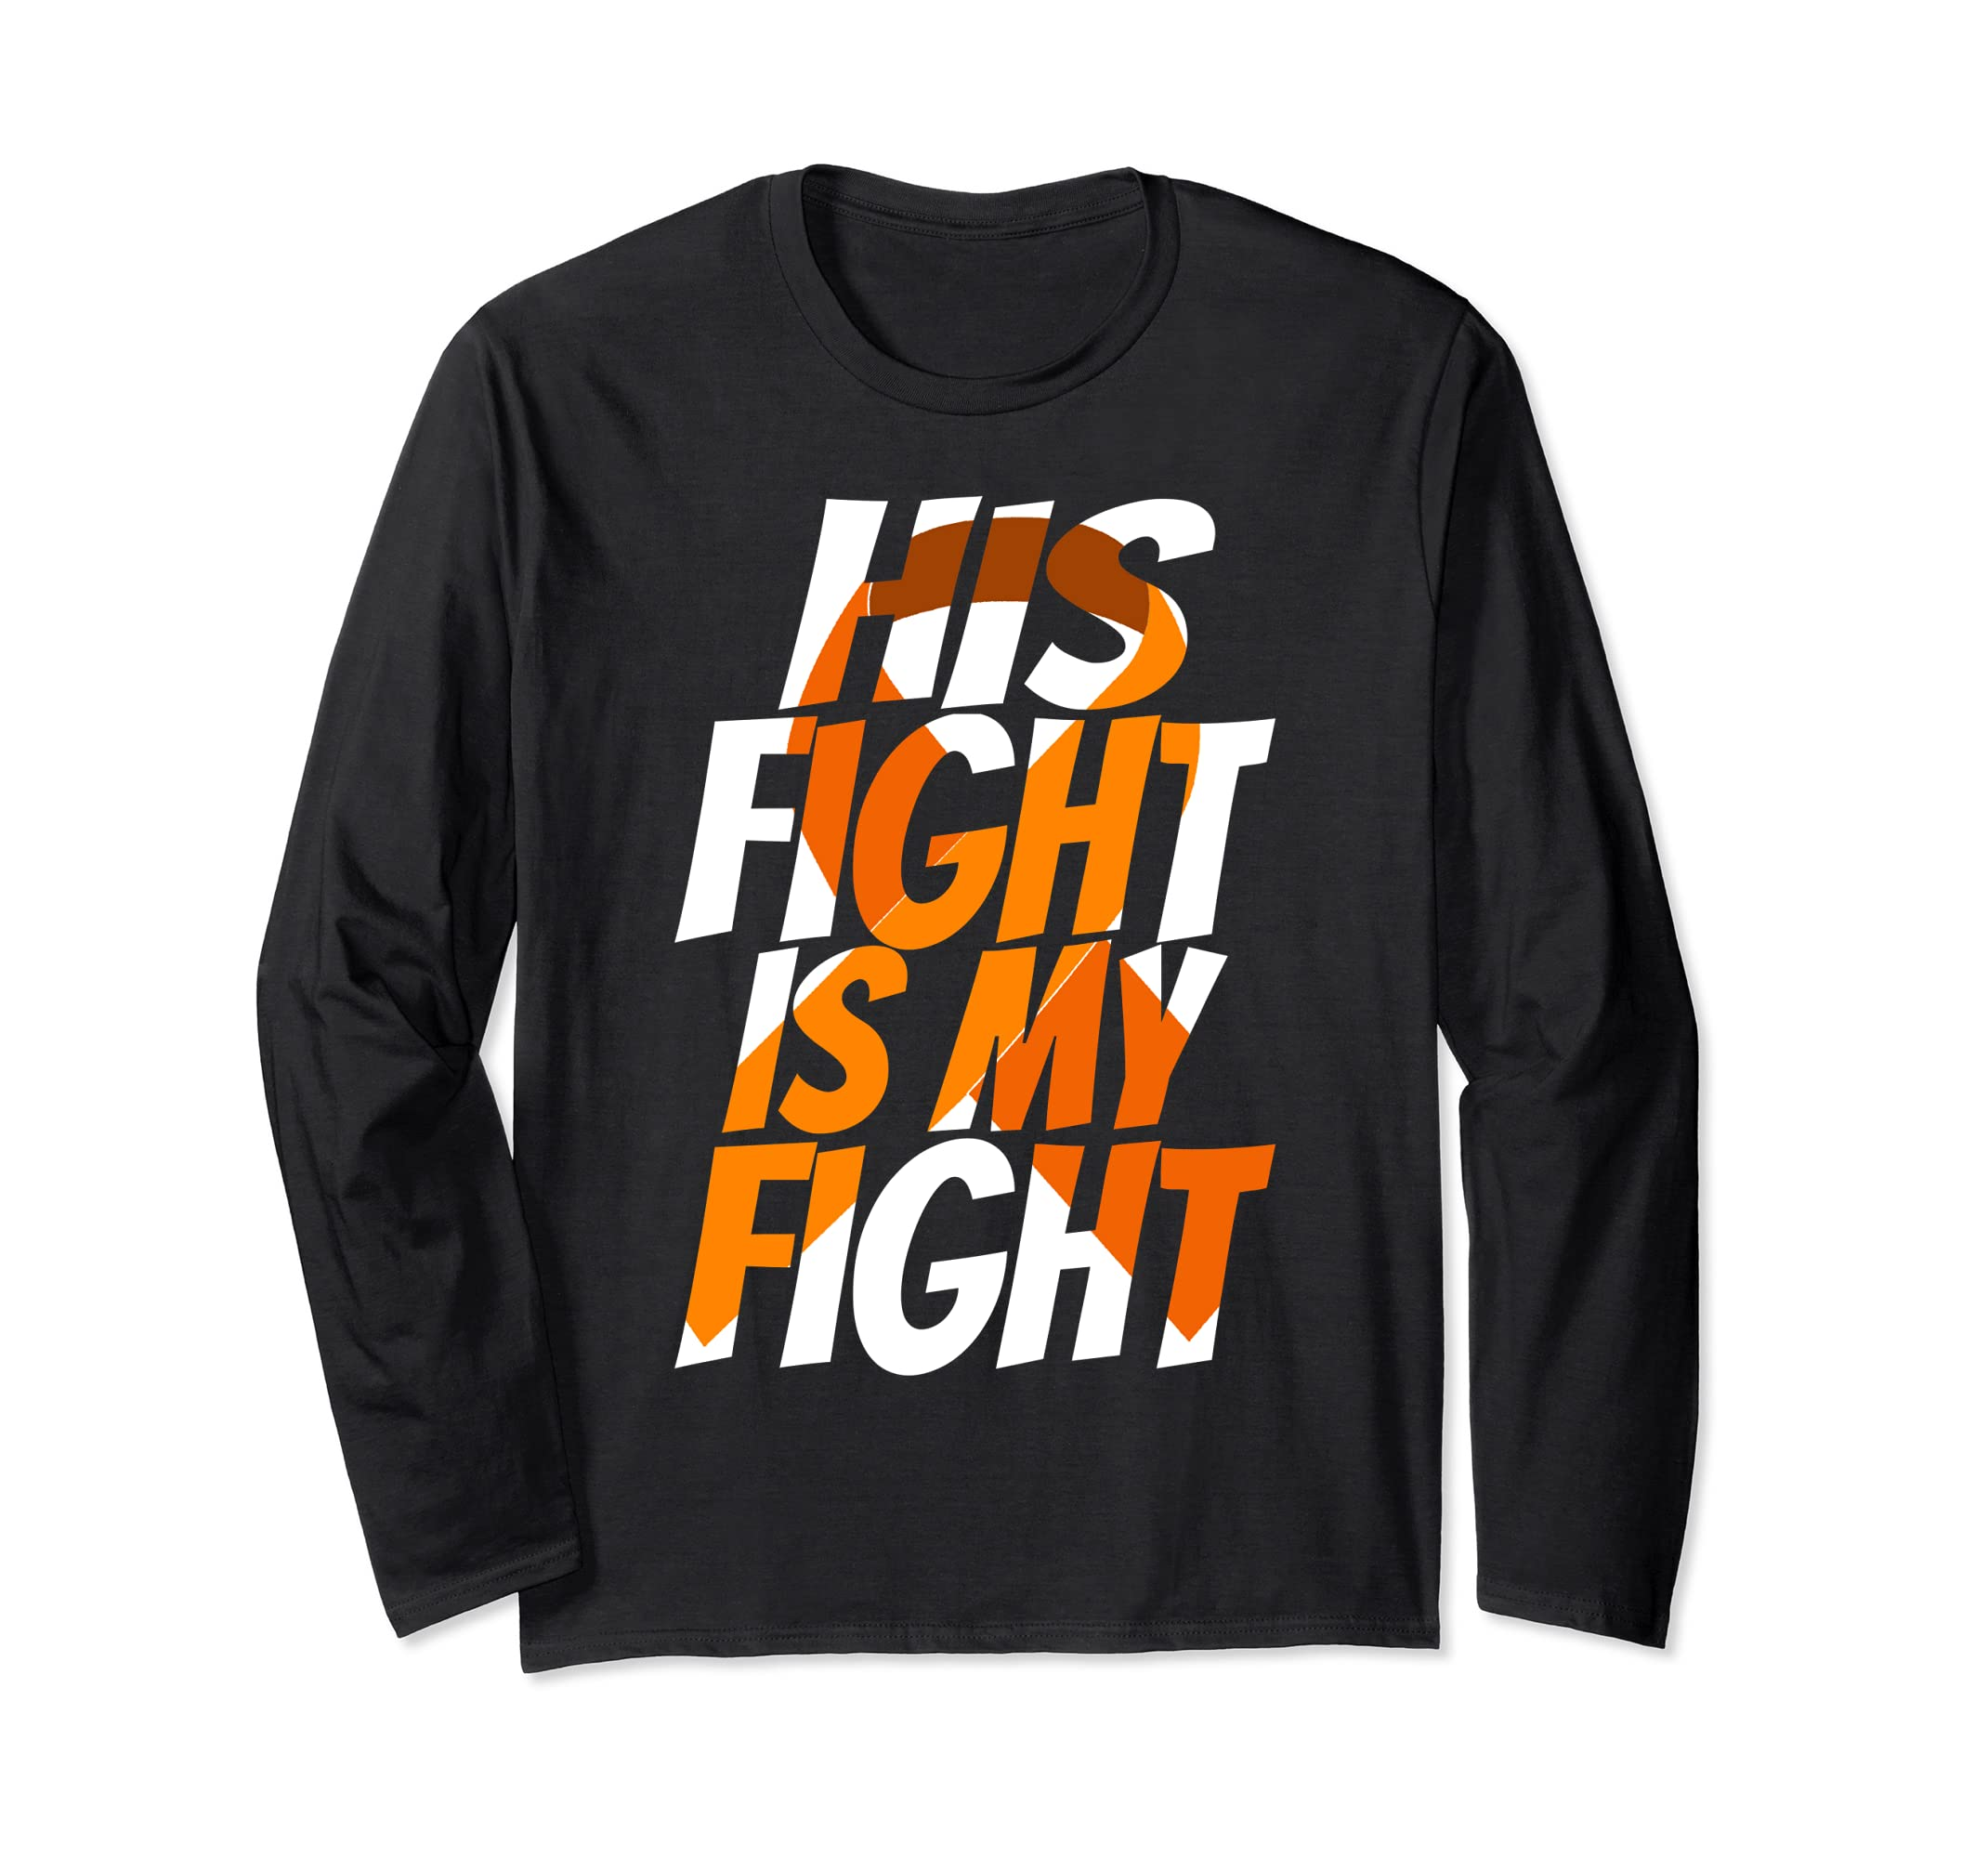 Orange Ribbon Leukemia Awareness Shirt Family Support gift